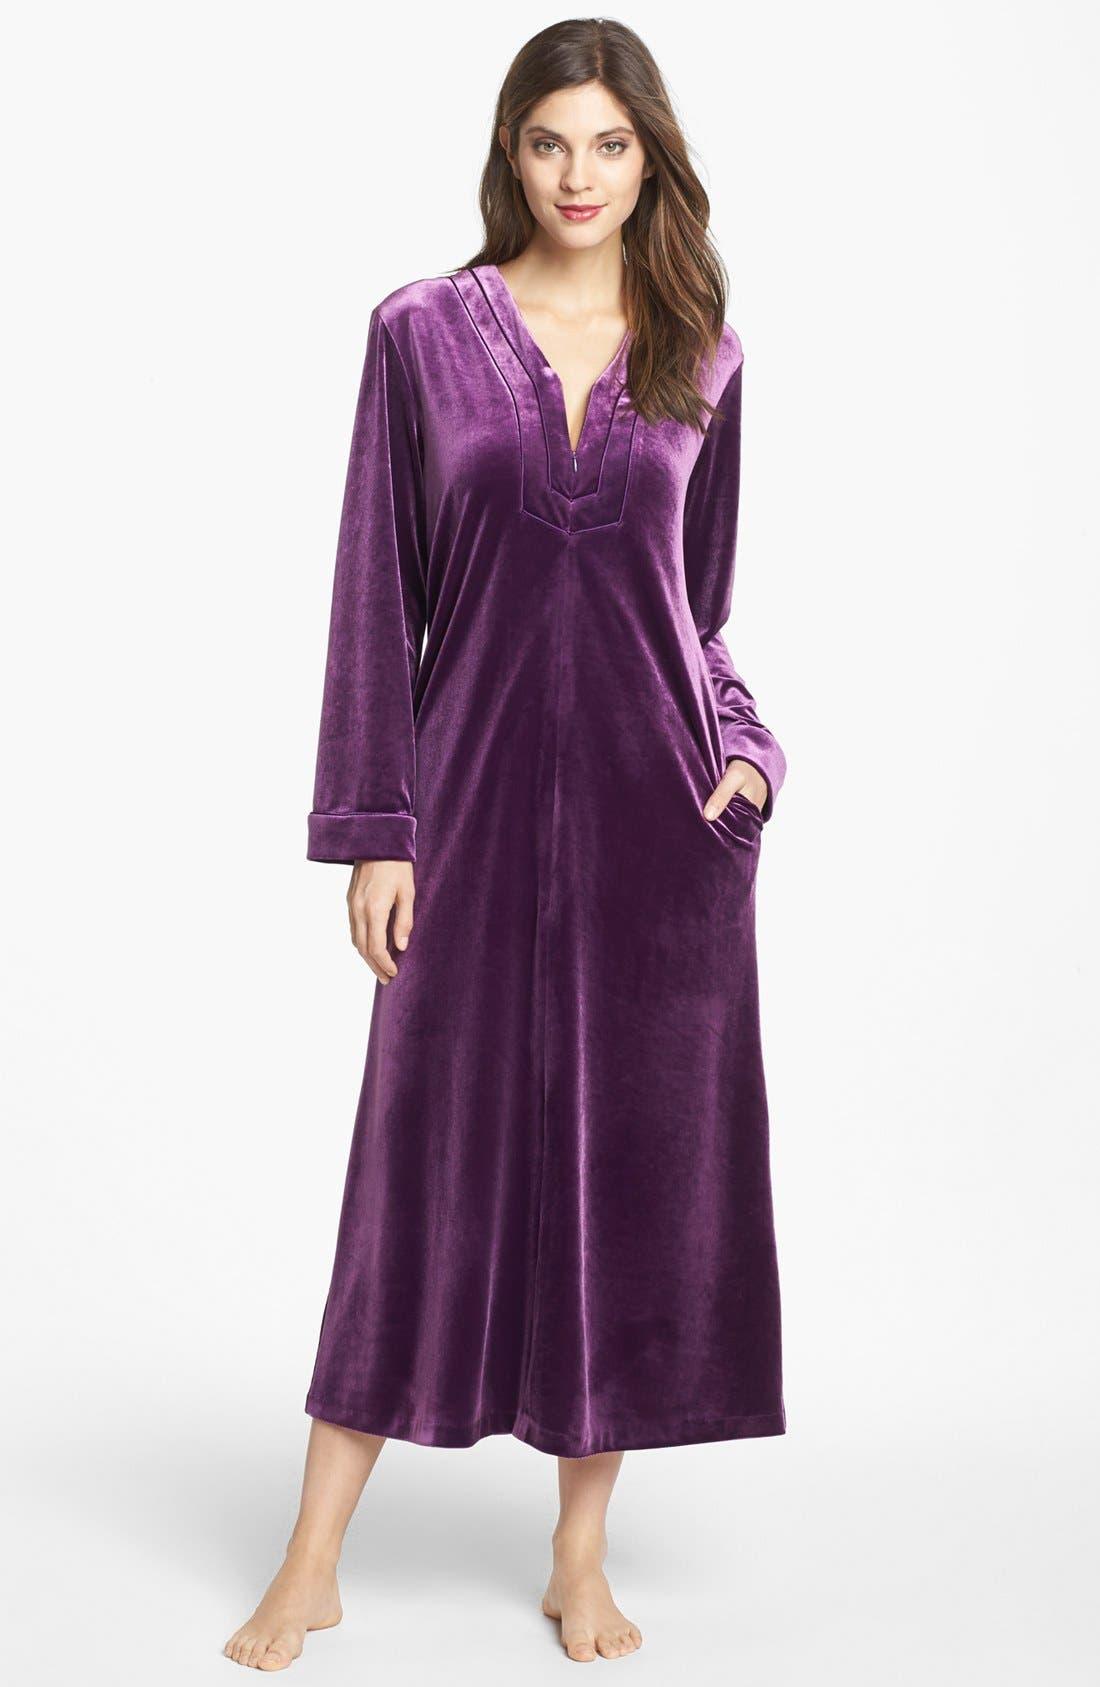 Main Image - Oscar de la Renta Sleepwear 'Zahara Nights' Zip Front Velvet Robe